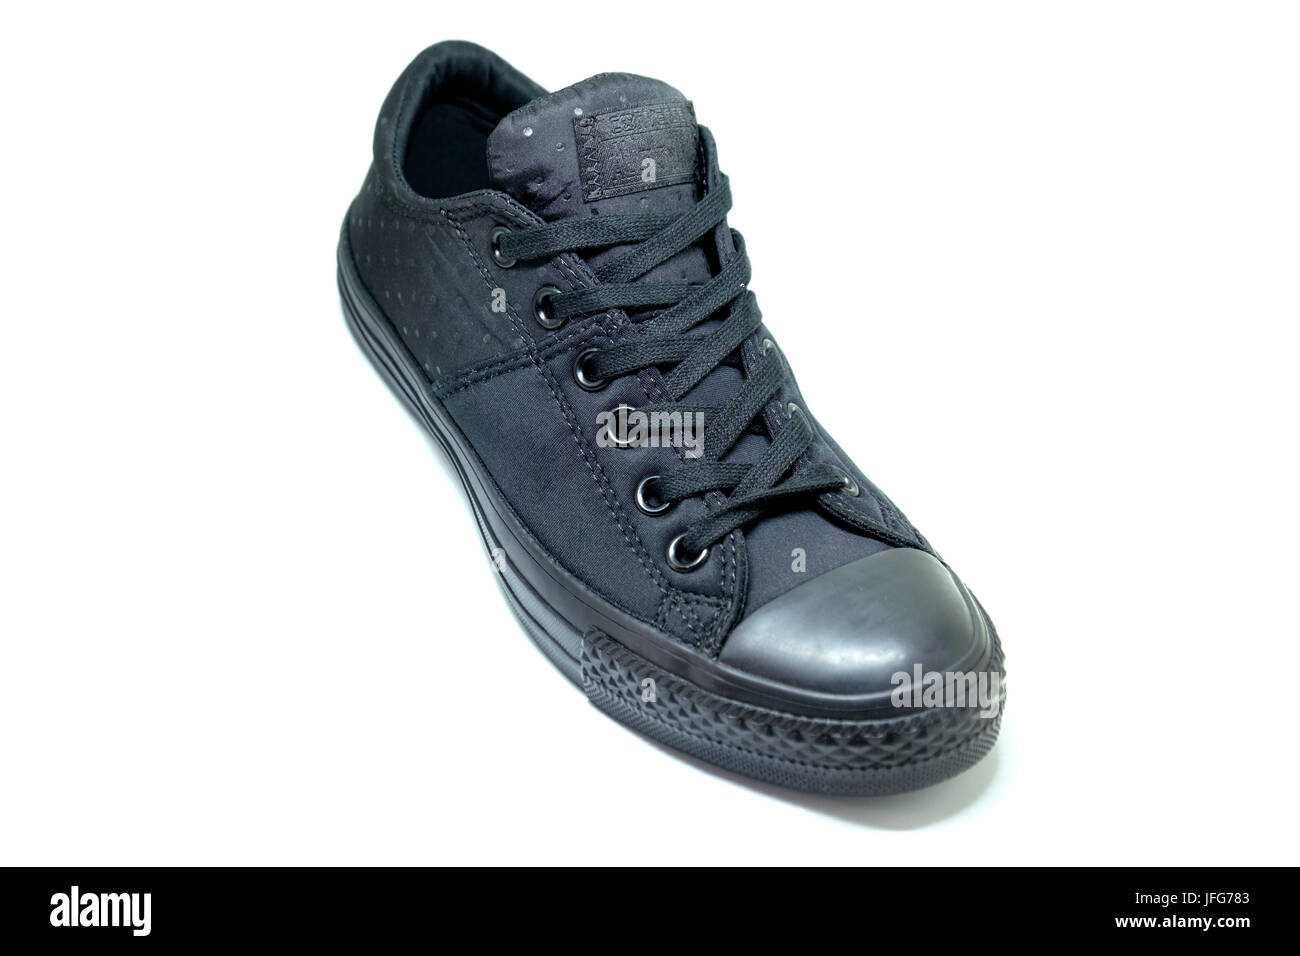 Black Converse Chuck Taylor All Star shoe - Stock Image